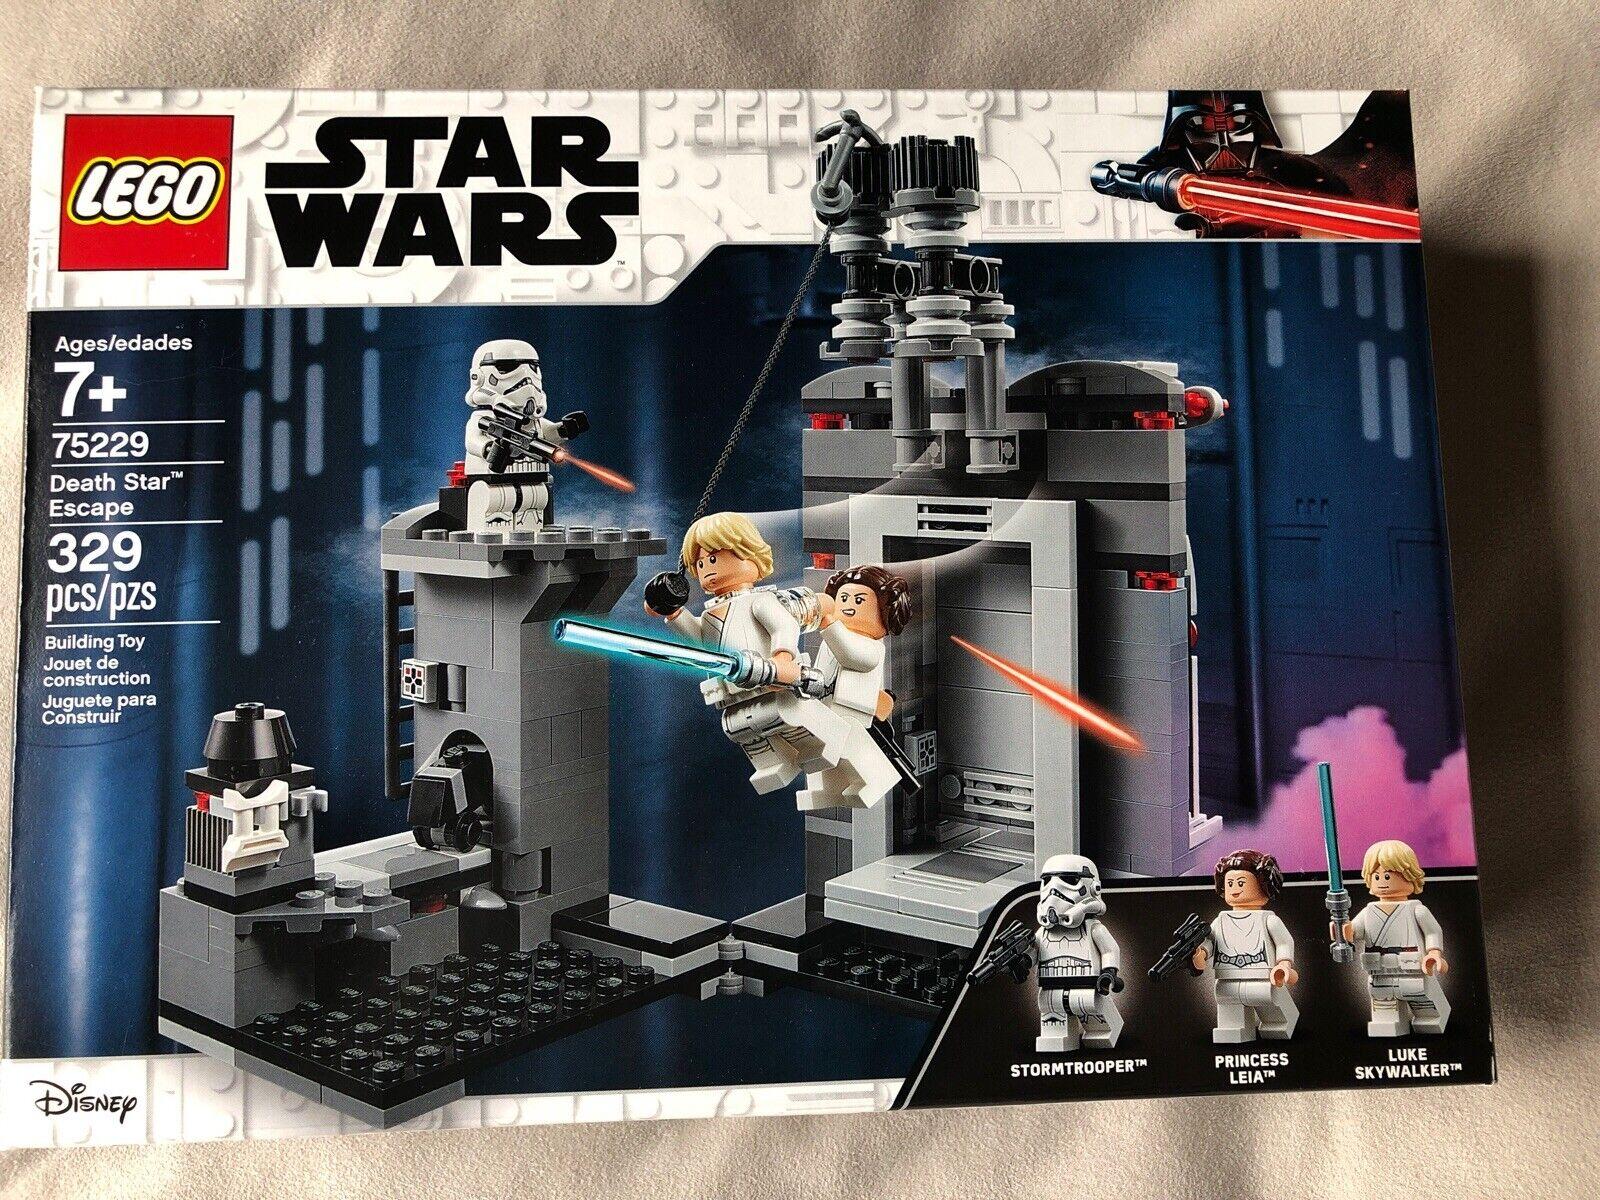 Lego Star Wars DEATH STAR ESCAPE 329 pcs 75229